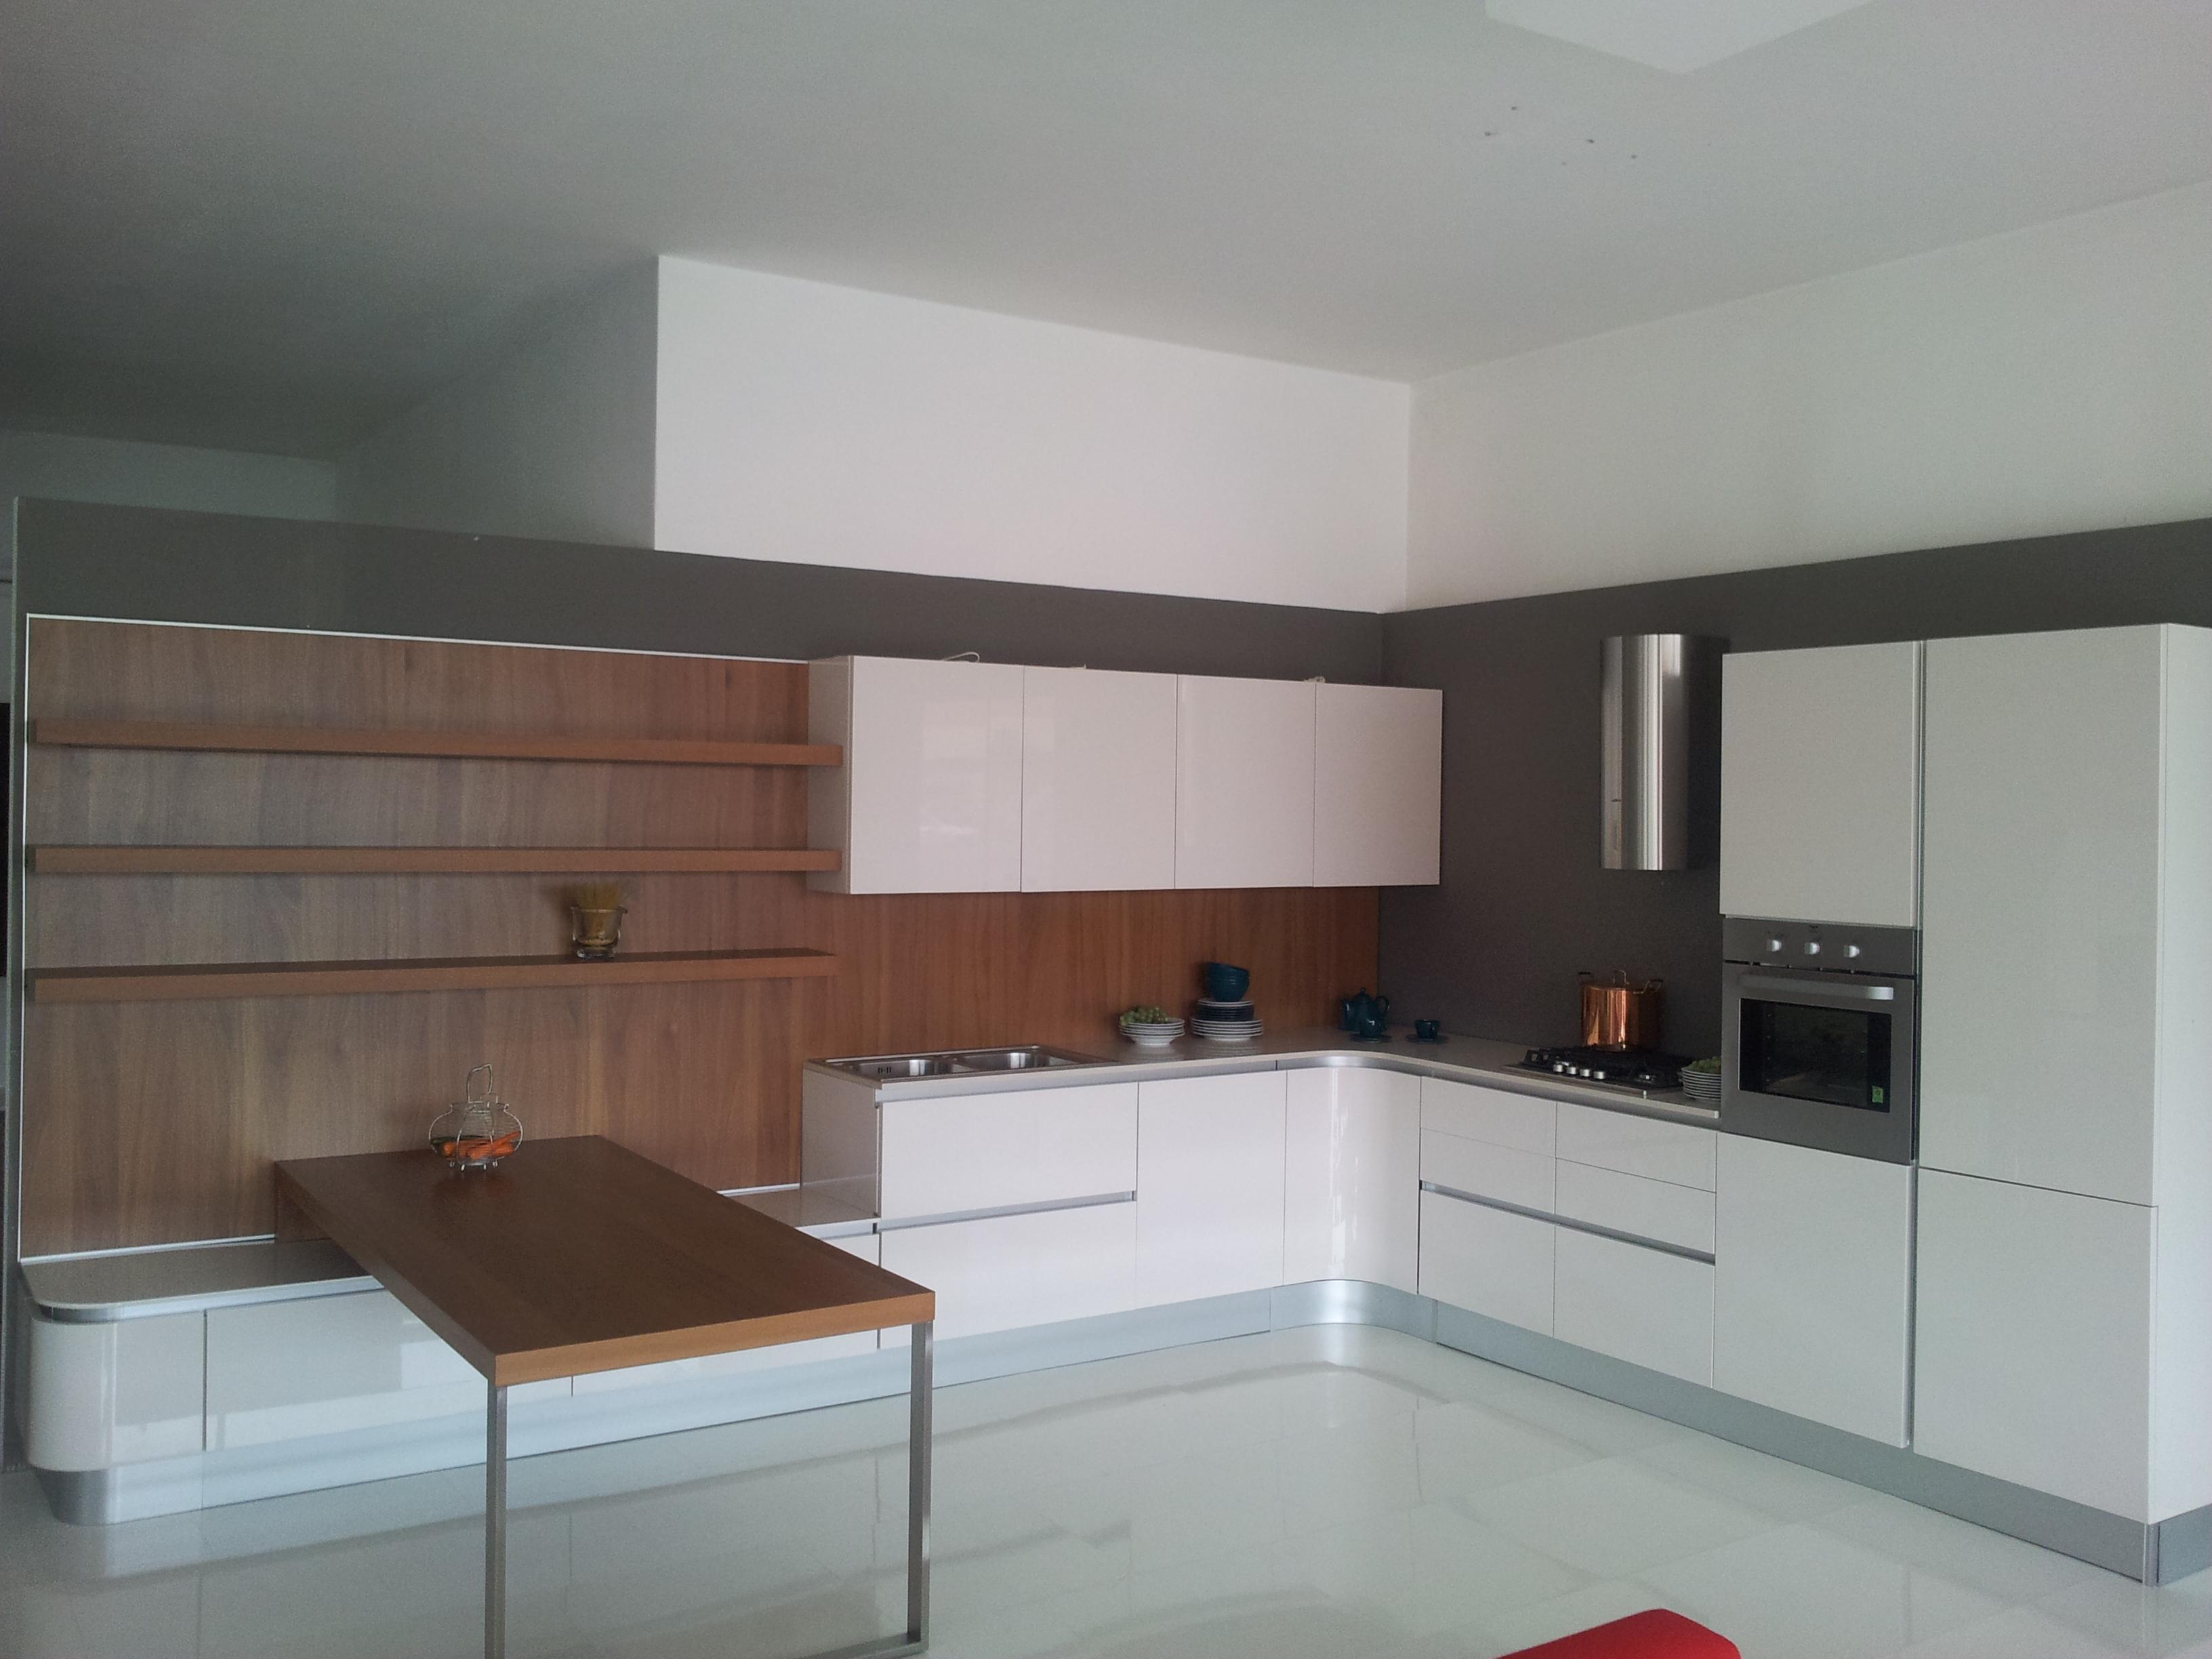 cucine di occasione : Cucina Doimo Occasione - Cucine a prezzi scontati